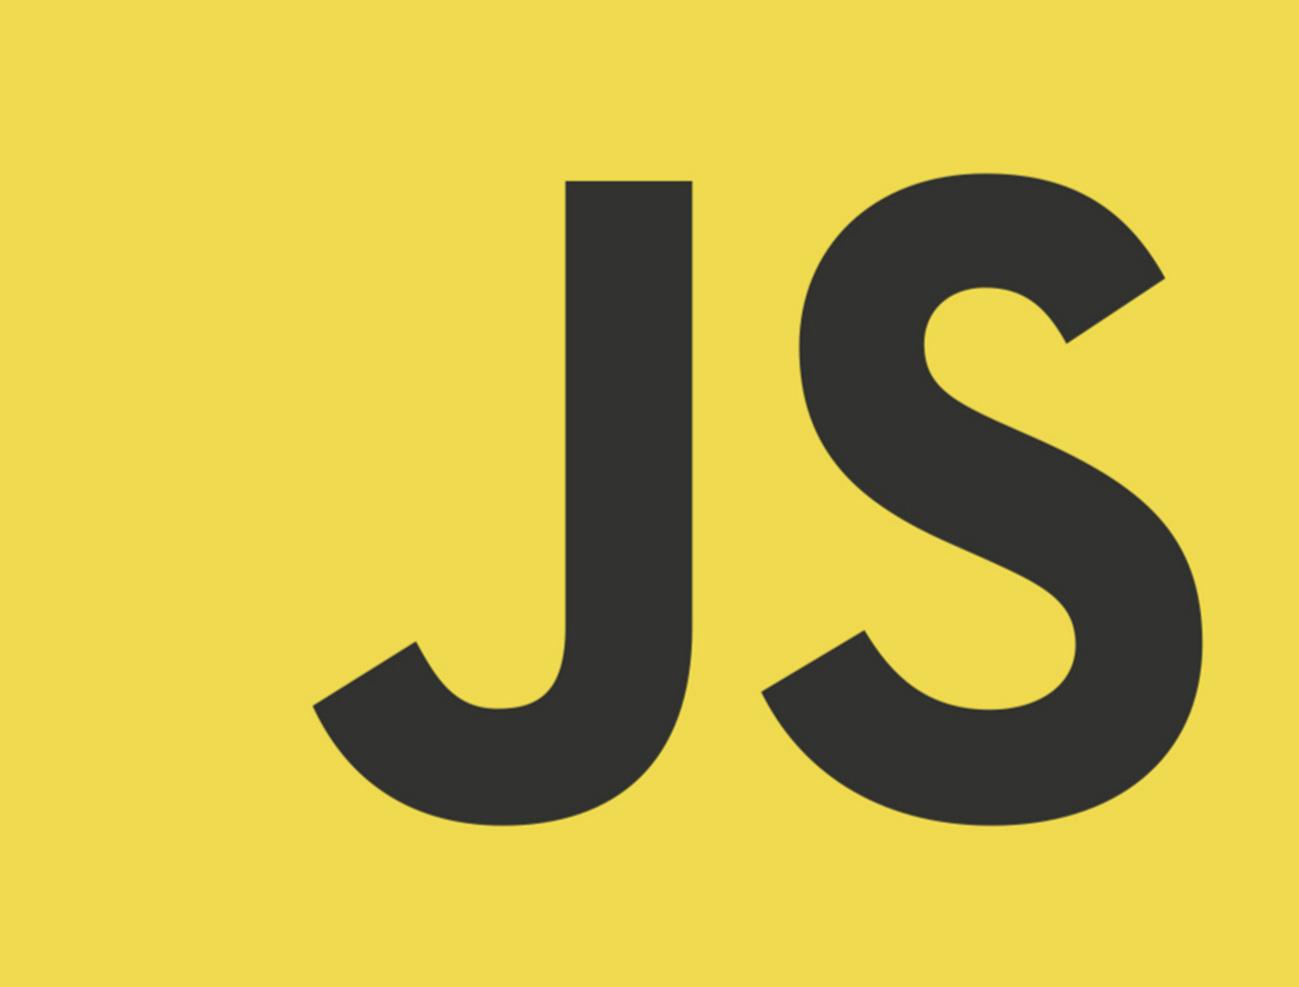 Aprender a programar con Javascript